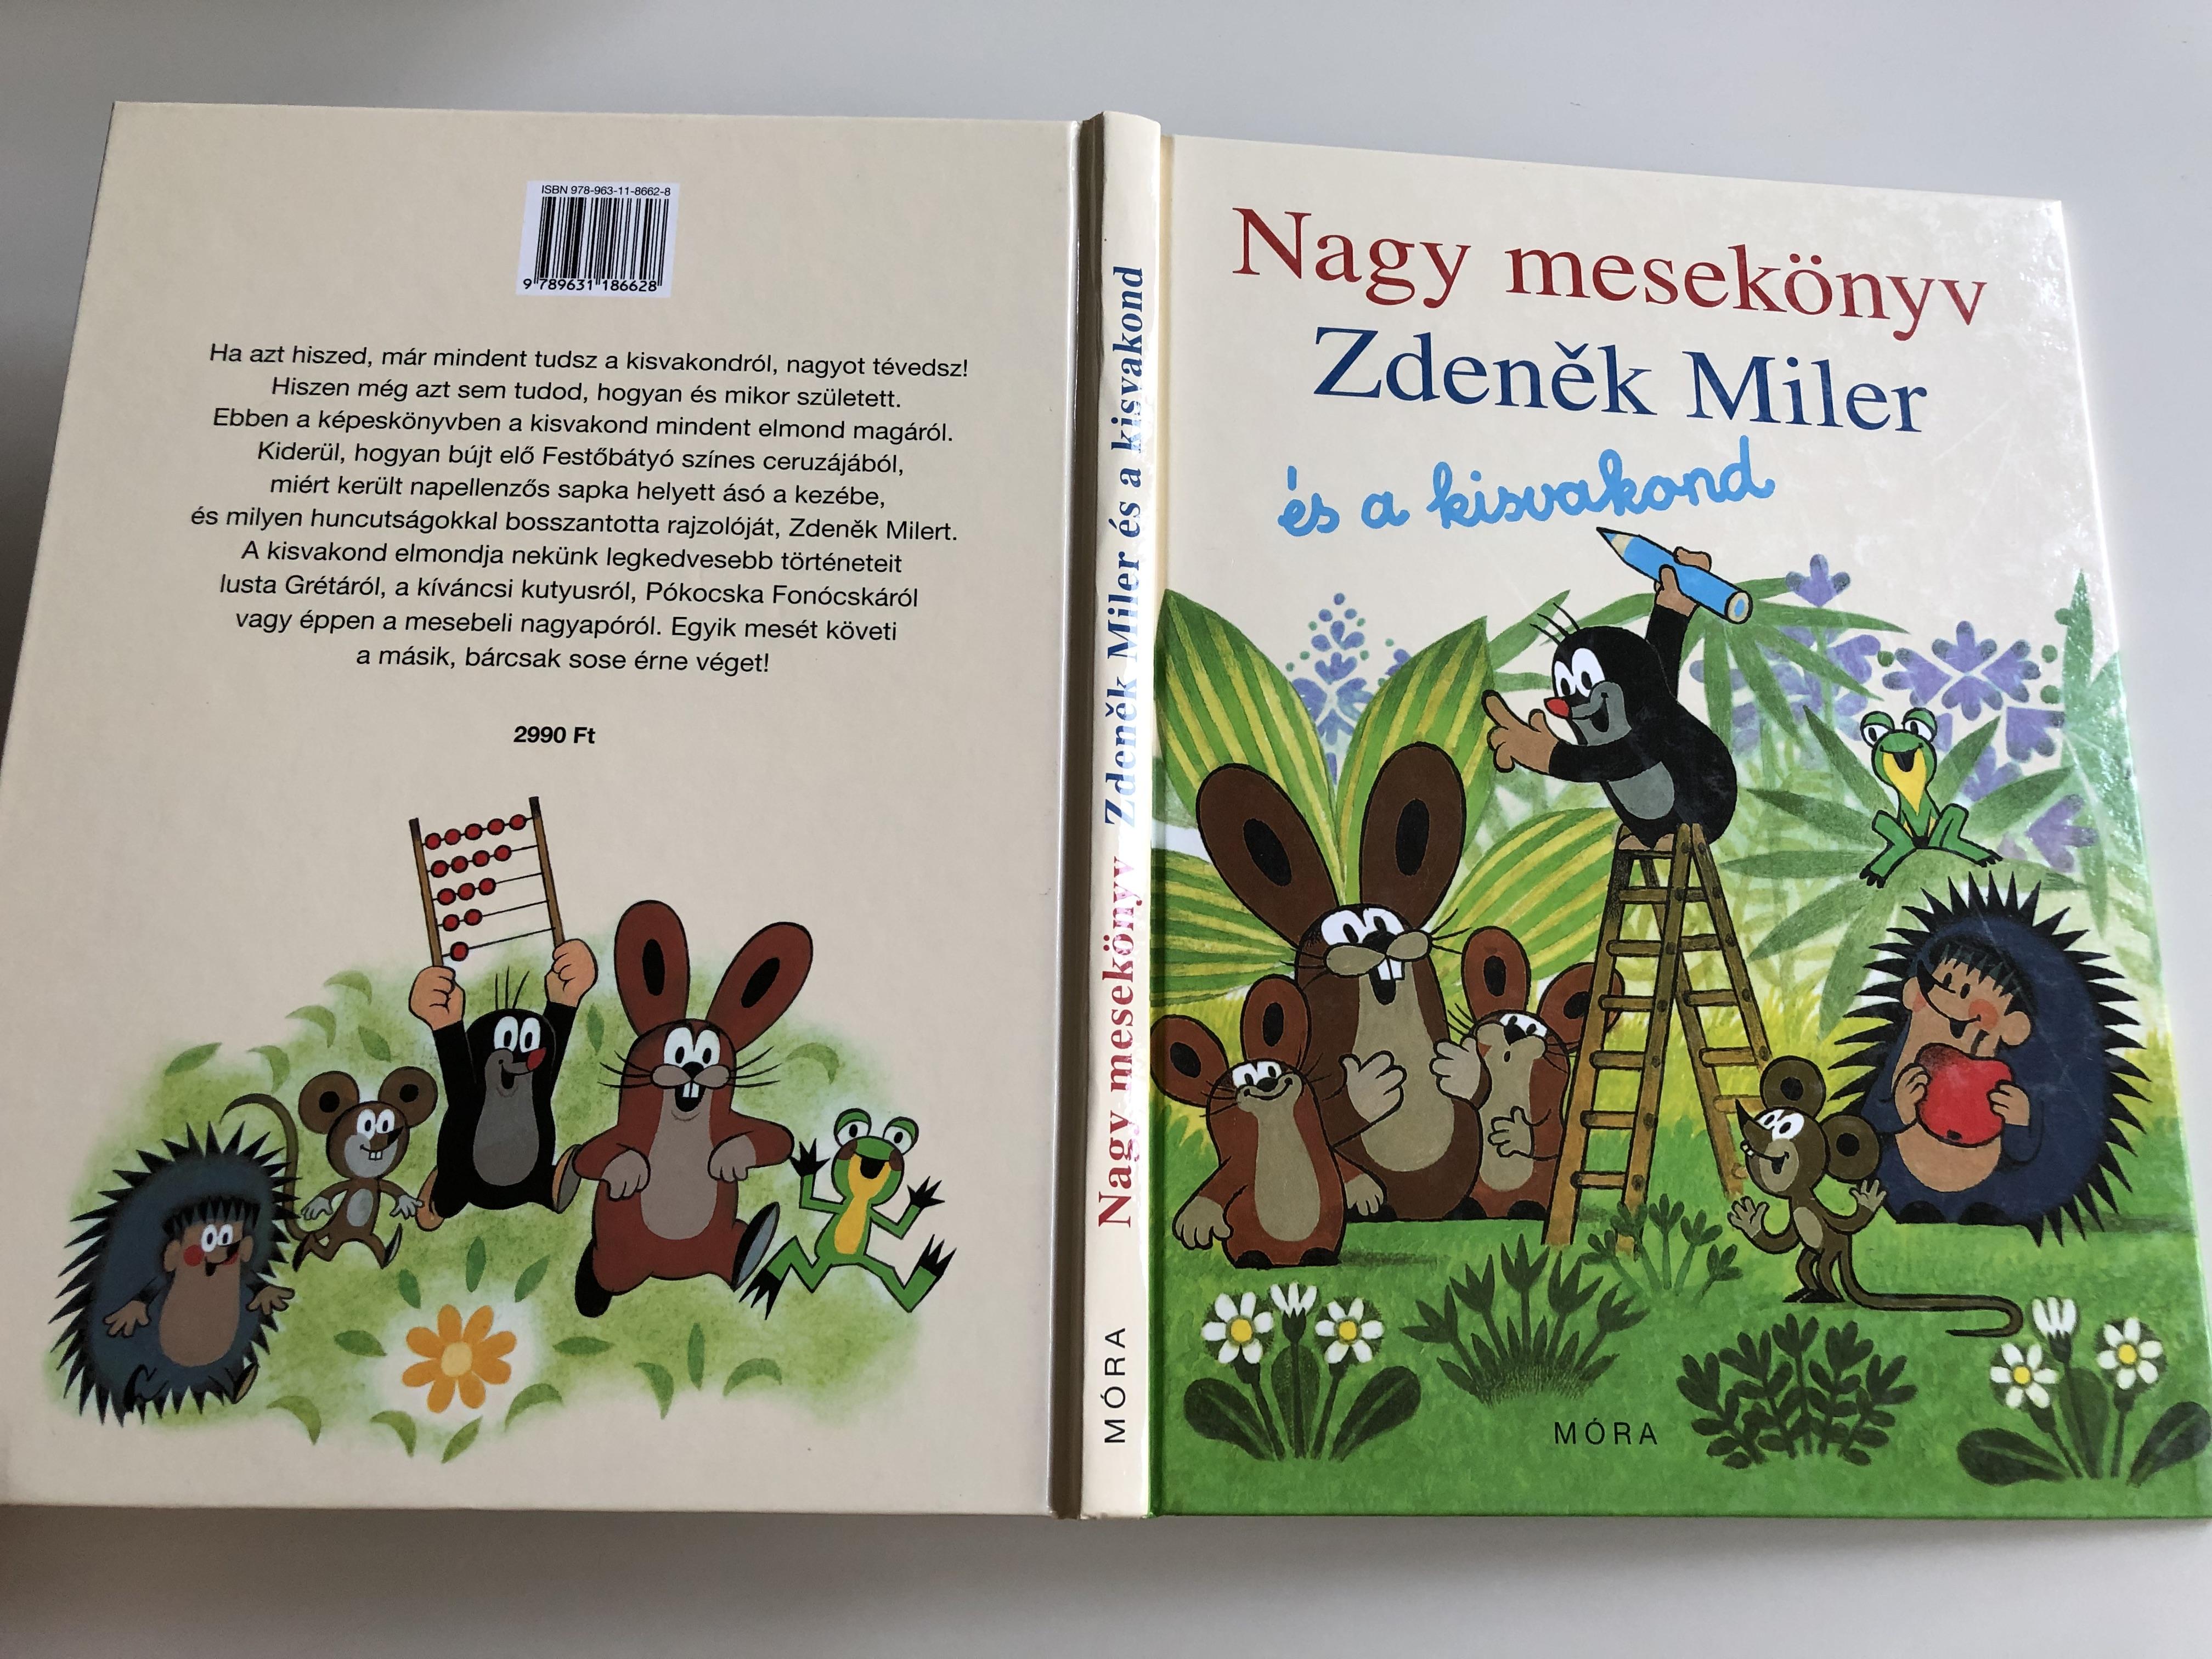 nagy-mesek-nyv-zdenek-miler-s-a-kisvakond-hungarian-translation-of-d-tem-big-story-book-zdenek-miler-and-krtek-little-mole-m-ra-k-nyvkiad-2009-18-.jpg